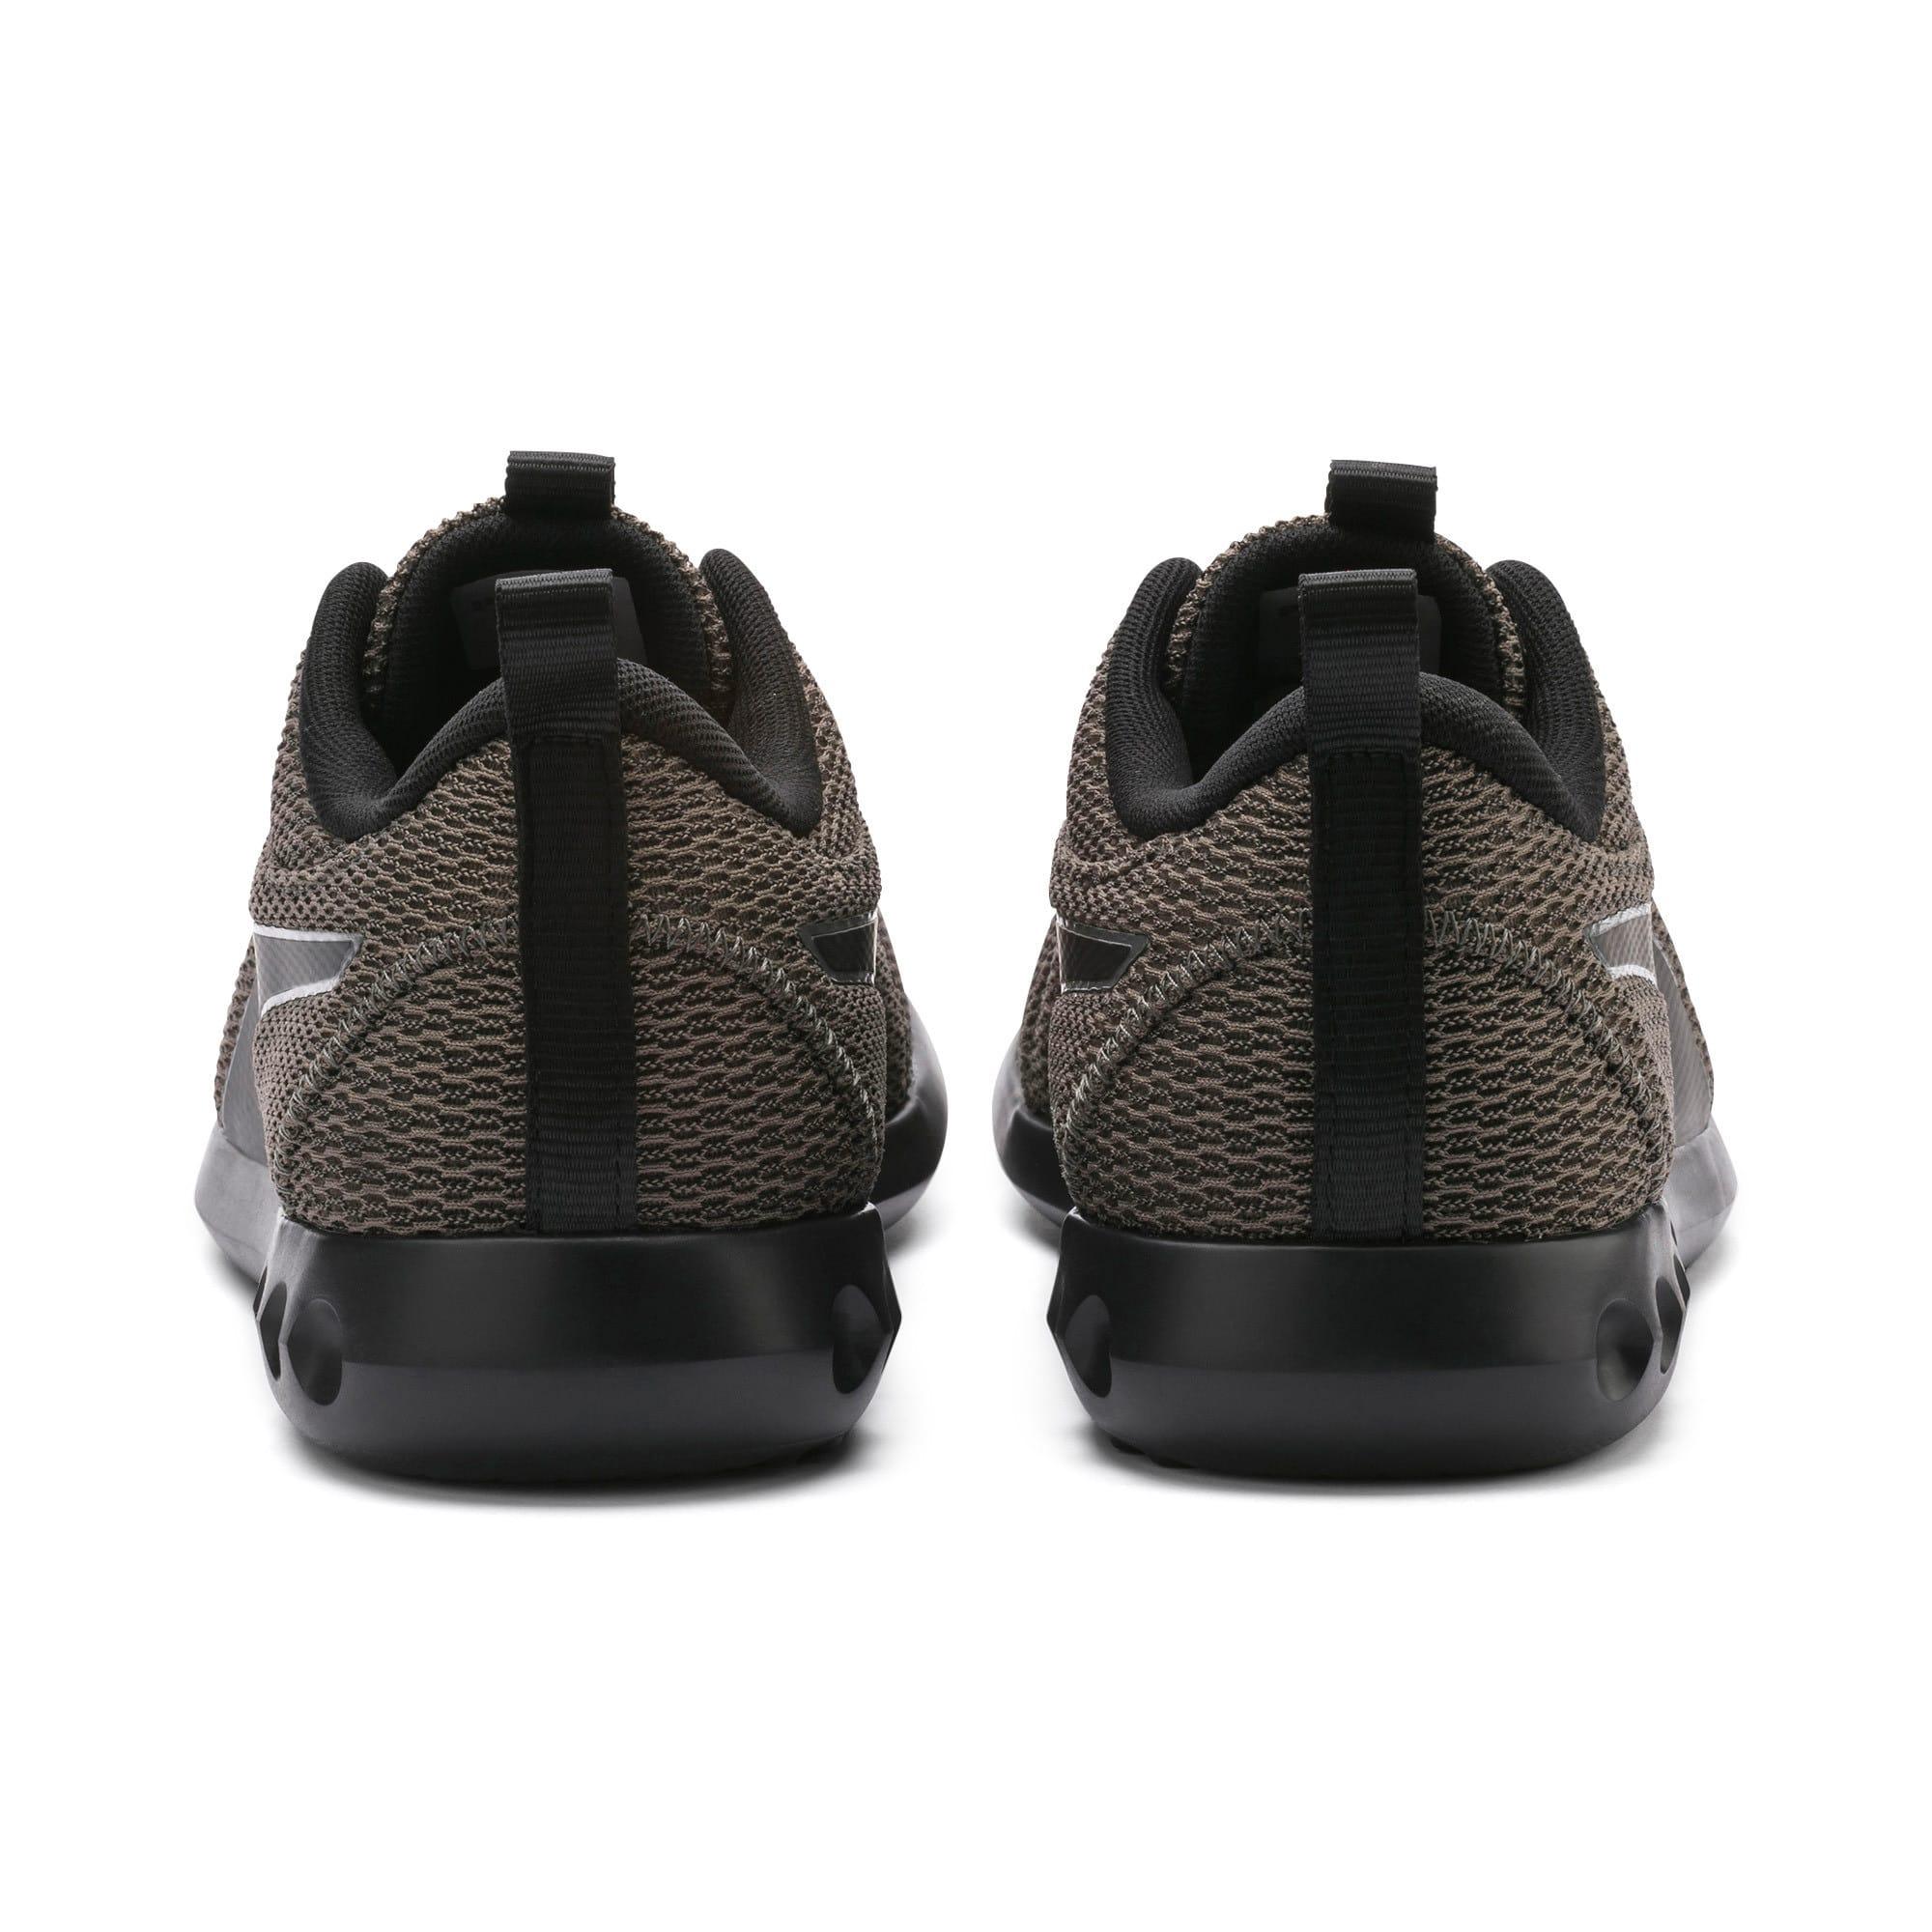 Miniatura 3 de Zapatos para correrCarson 2 New Corepara hombre, Charcoal Gray-Puma Black, mediano